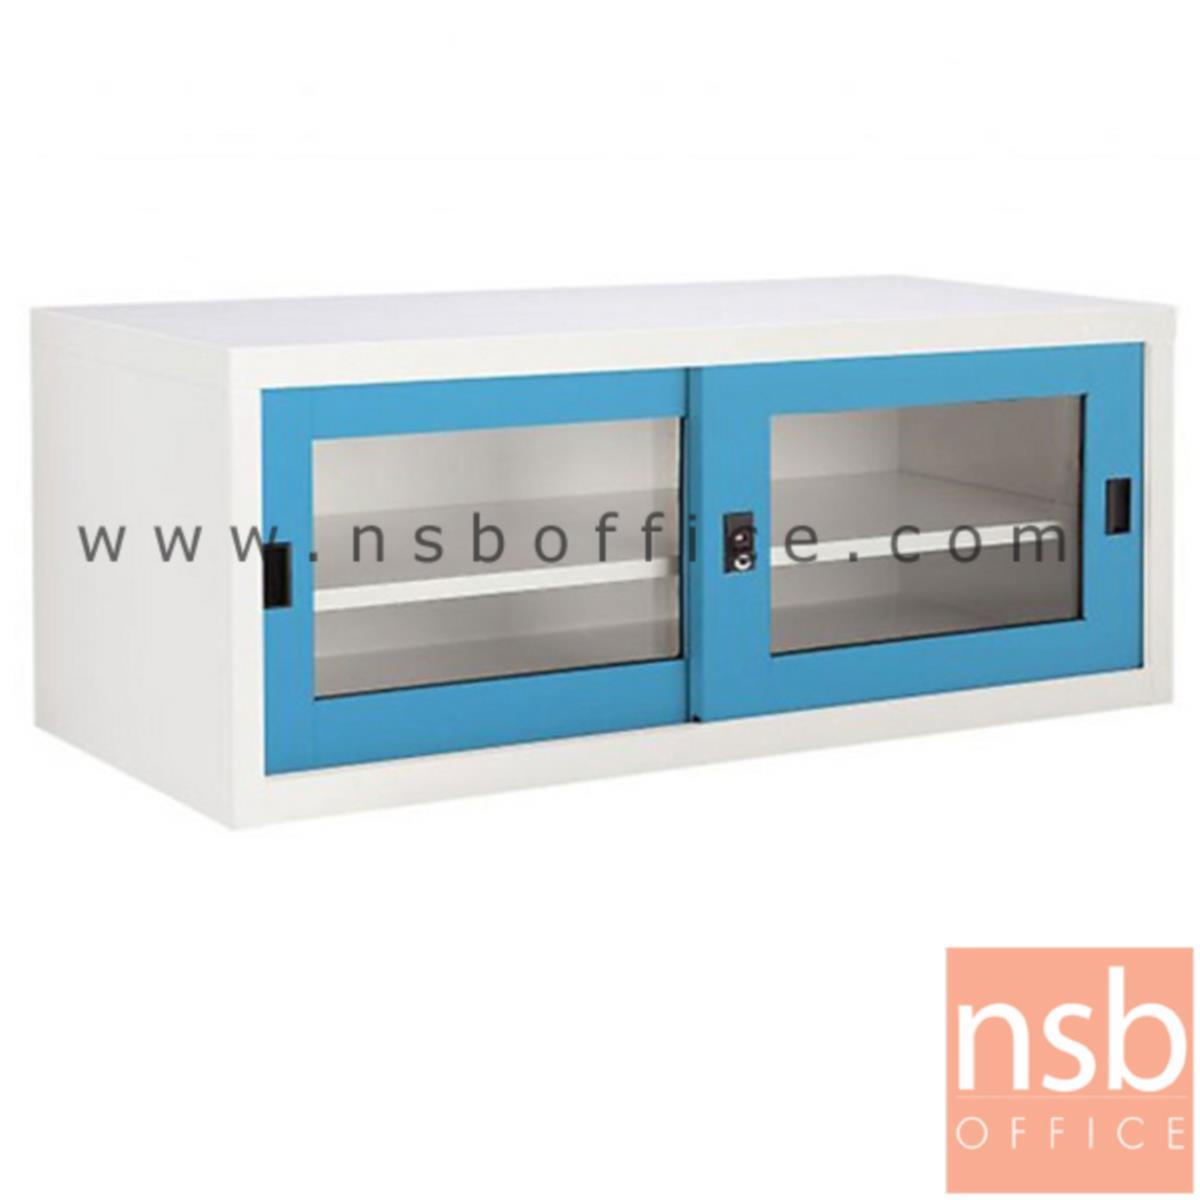 E25A006:ตู้เหล็กบานเลื่อนกระจกเตี้ย 3 ฟุต หน้าบานสีสัน 88W*40.7D*44H cm รุ่น USB-2